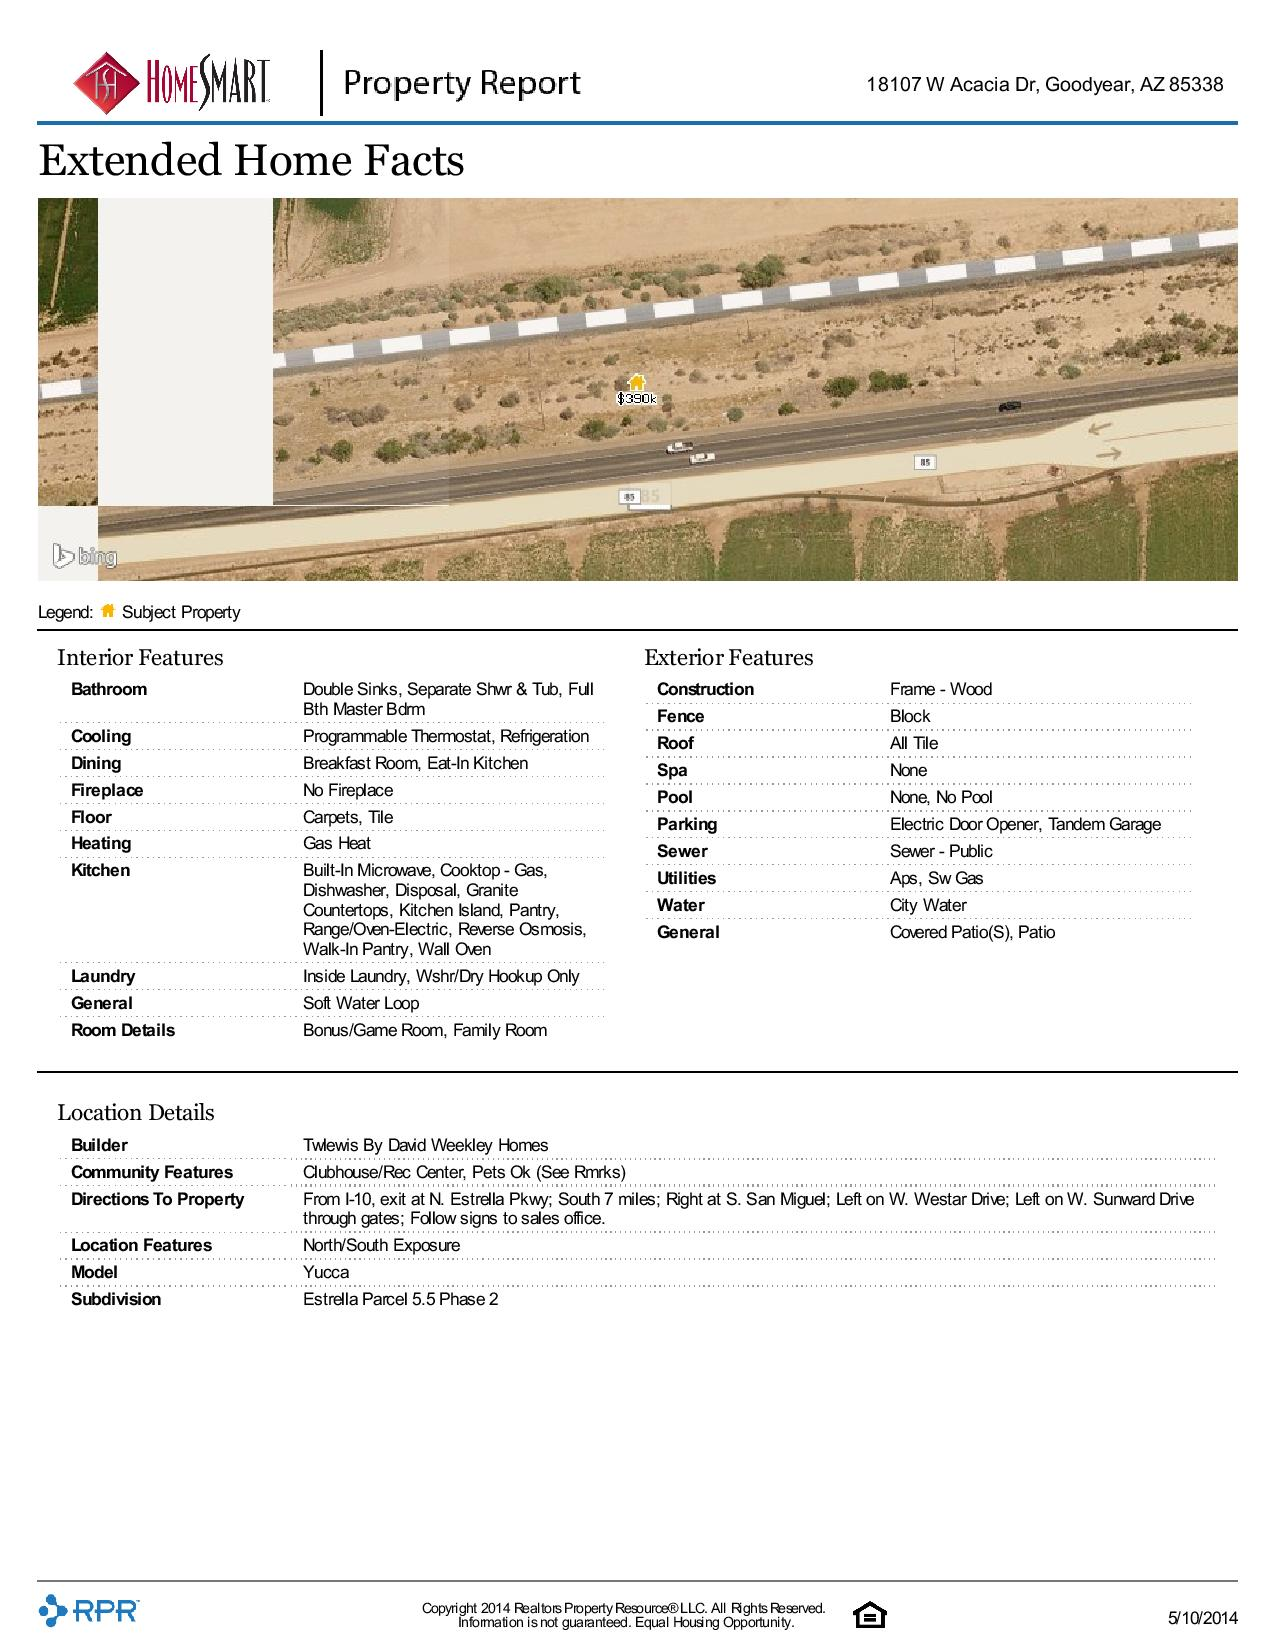 18107-W-Acacia-Dr-Goodyear-AZ-85338-page-004